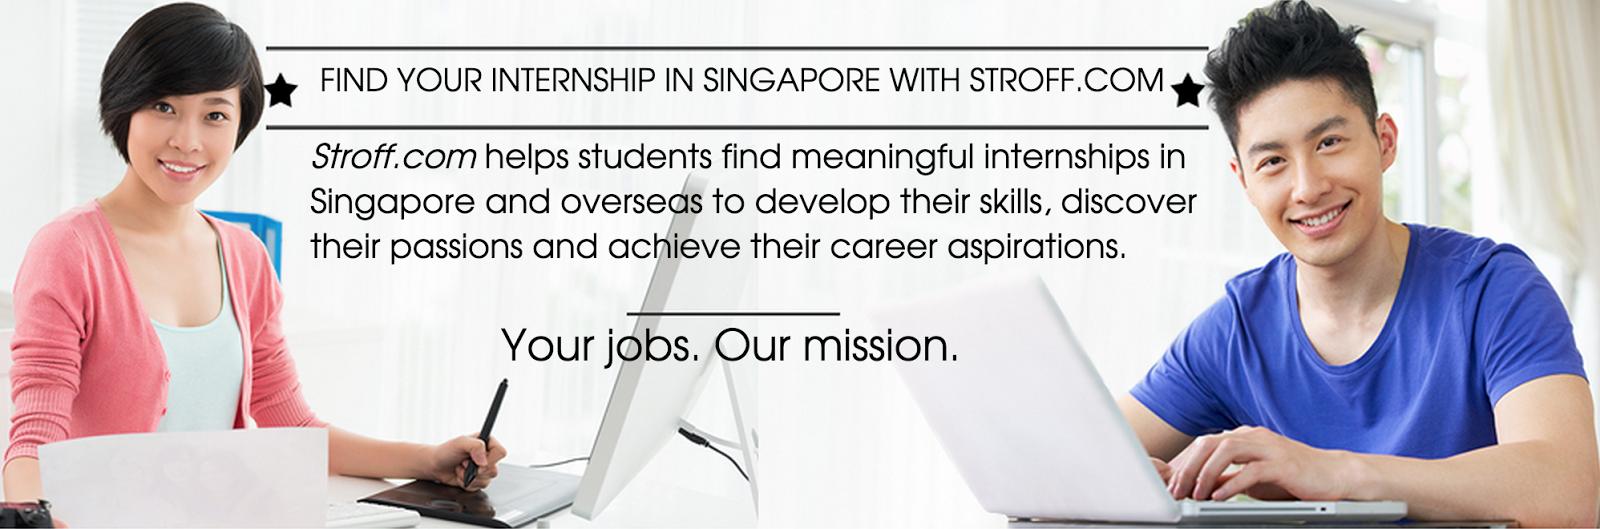 Internships  Internship Search and Intern Jobs